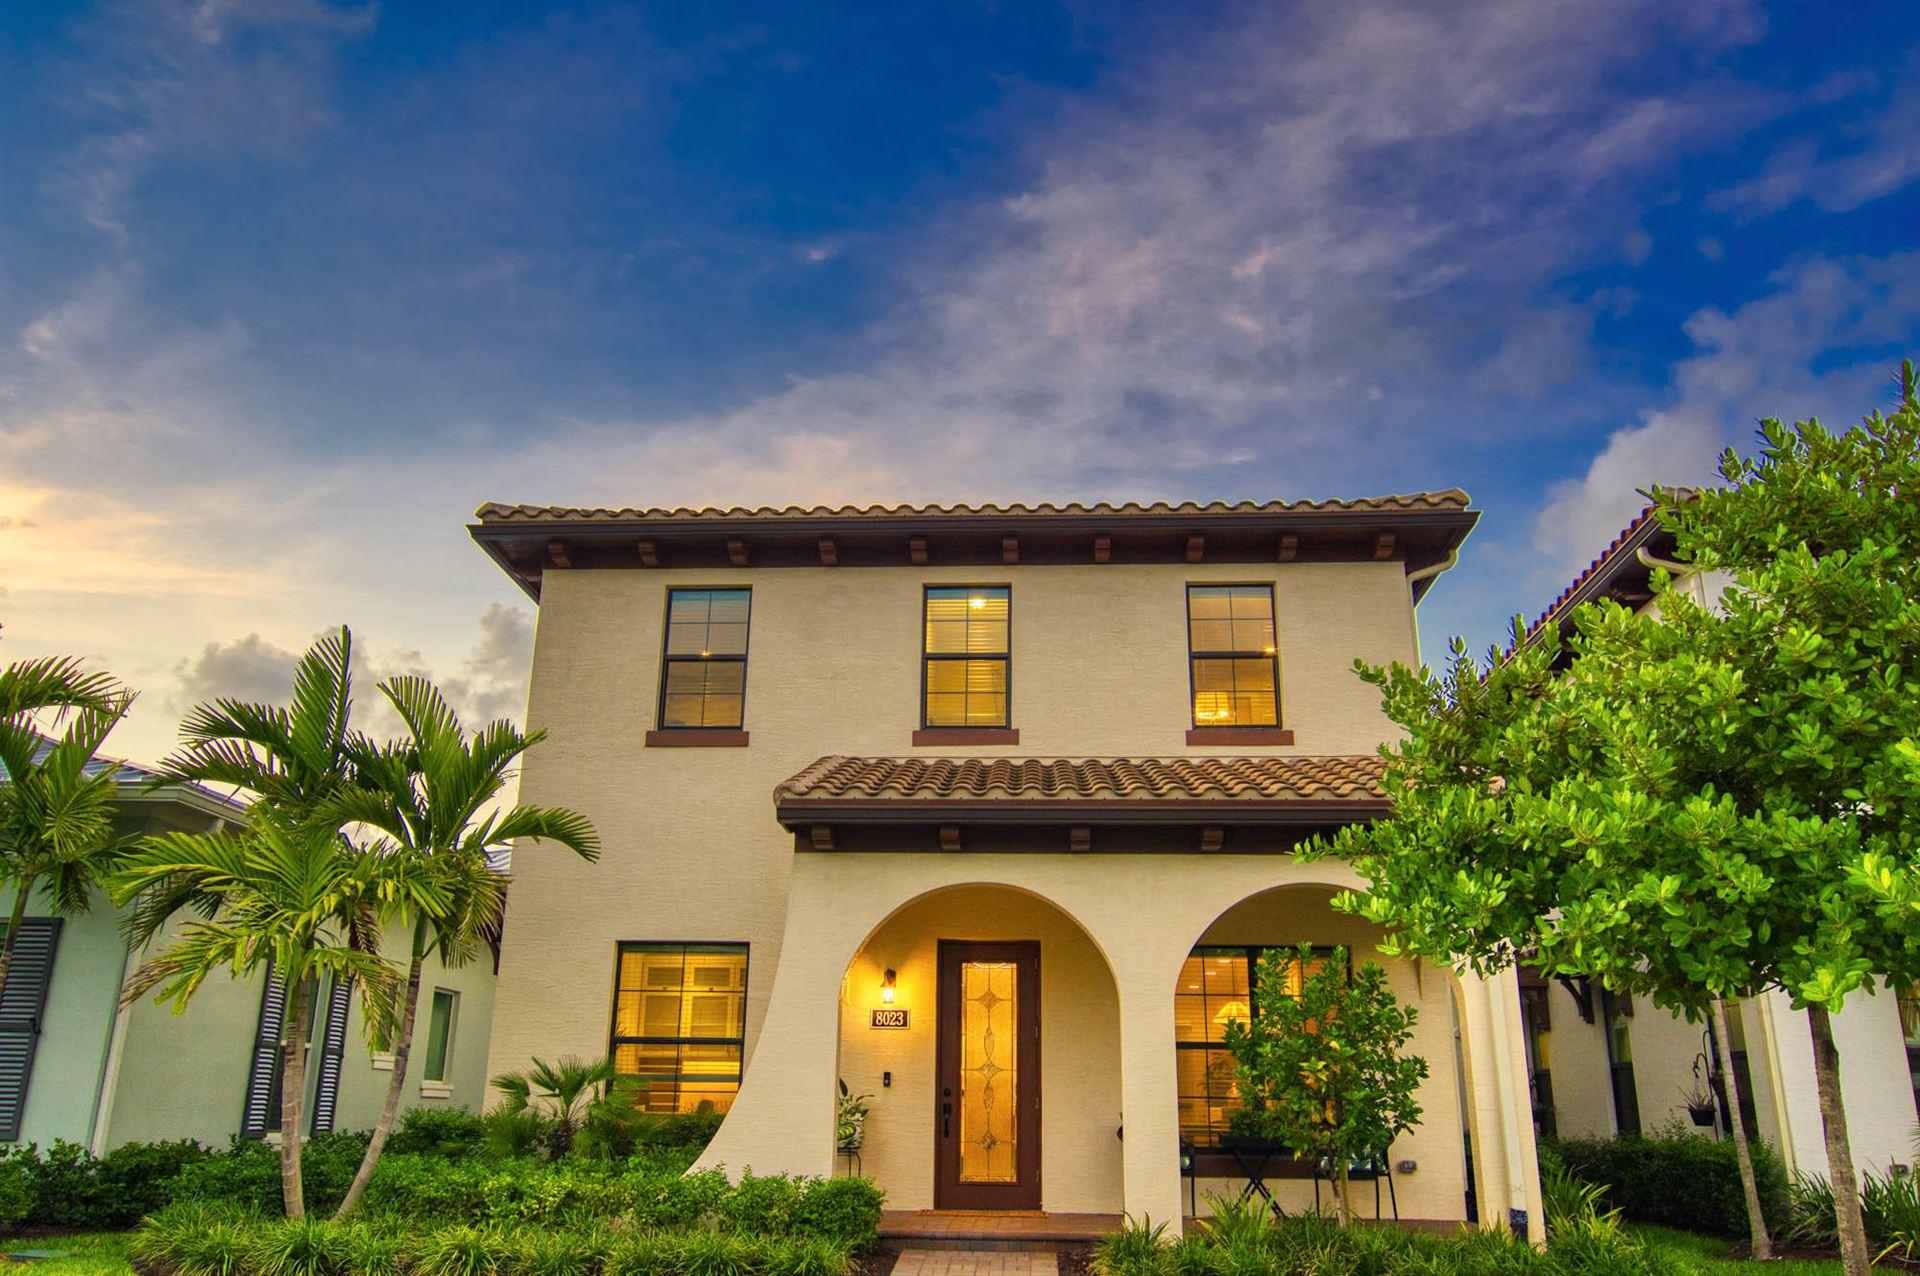 8023 Hobbes Way, Palm Beach Gardens, FL 33418 - #: RX-10719806